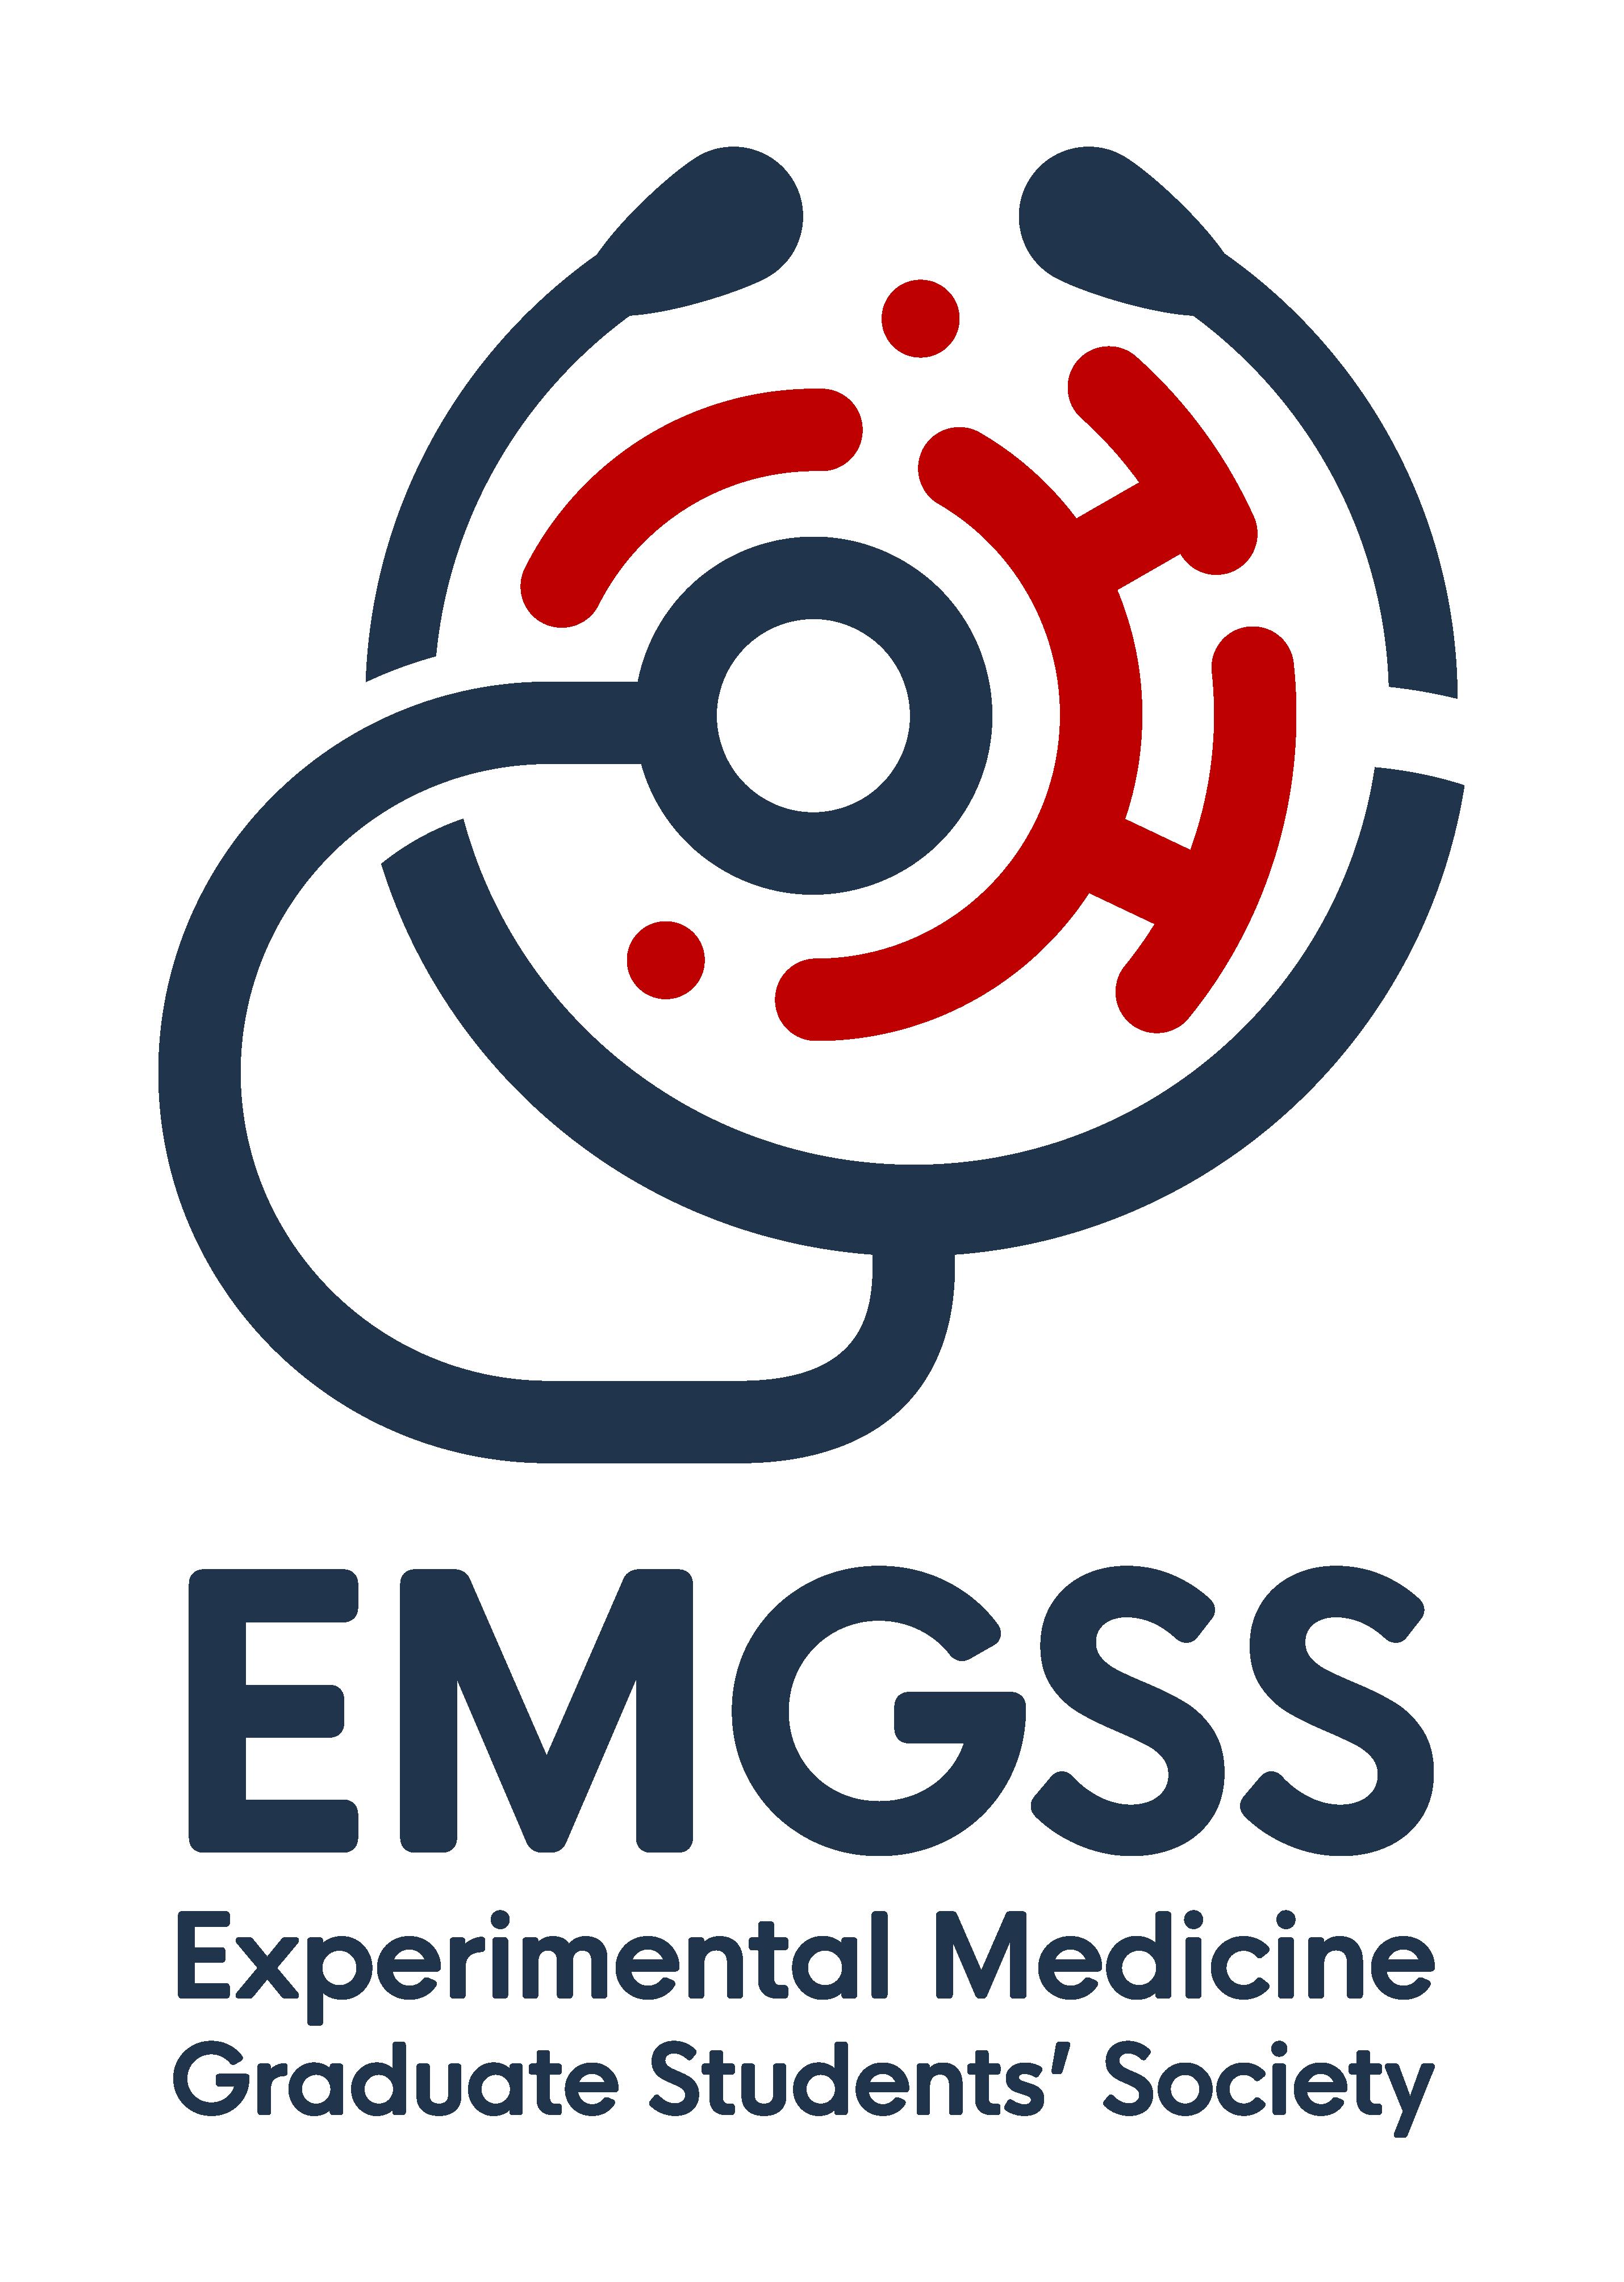 EMGSS Experimental Medicine Graduate Students' Society